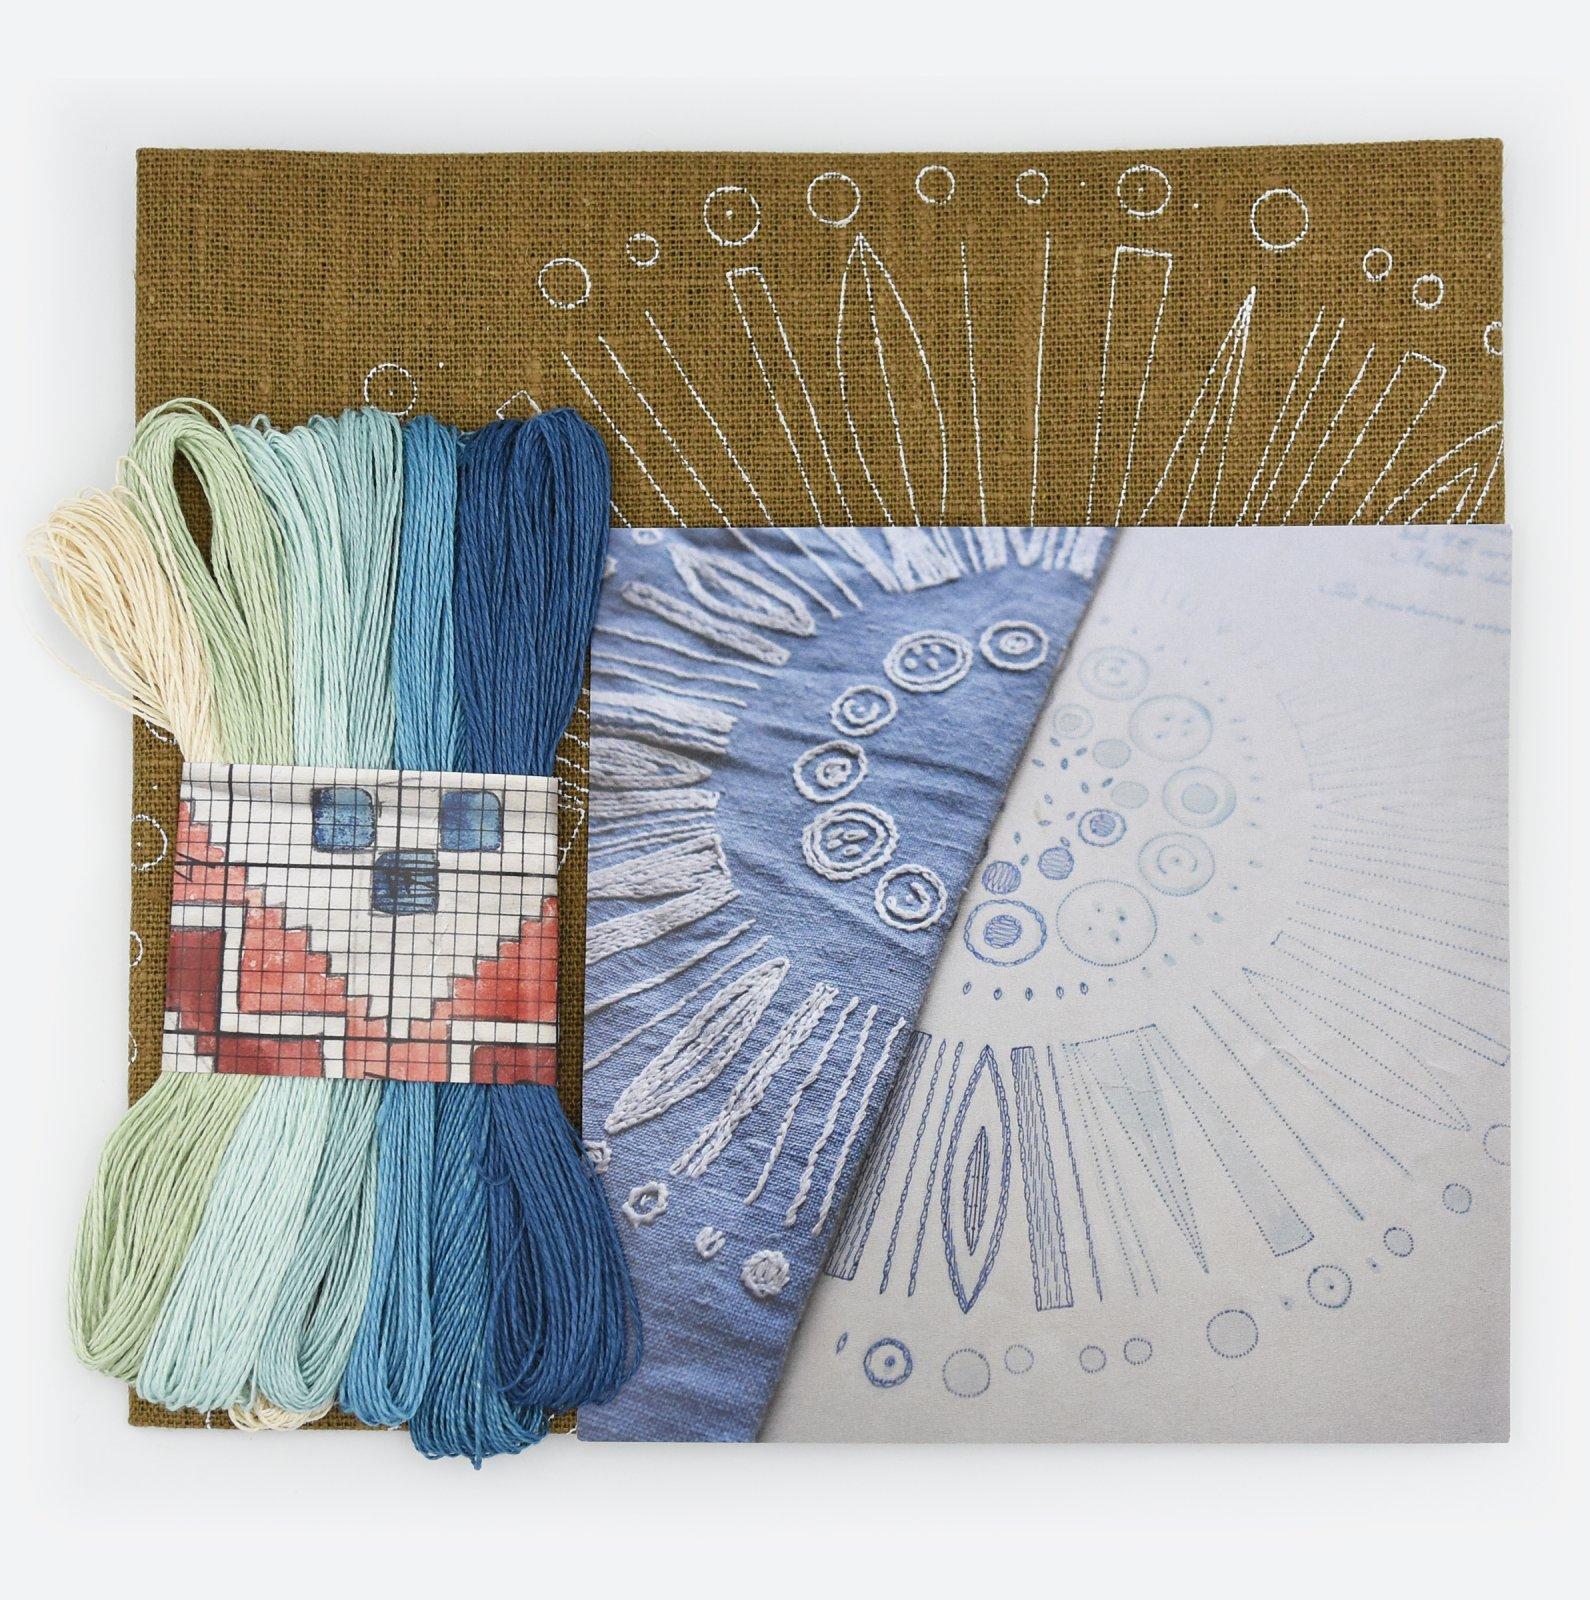 Linladan - Woodland Circle - Nordiska print with linen threads